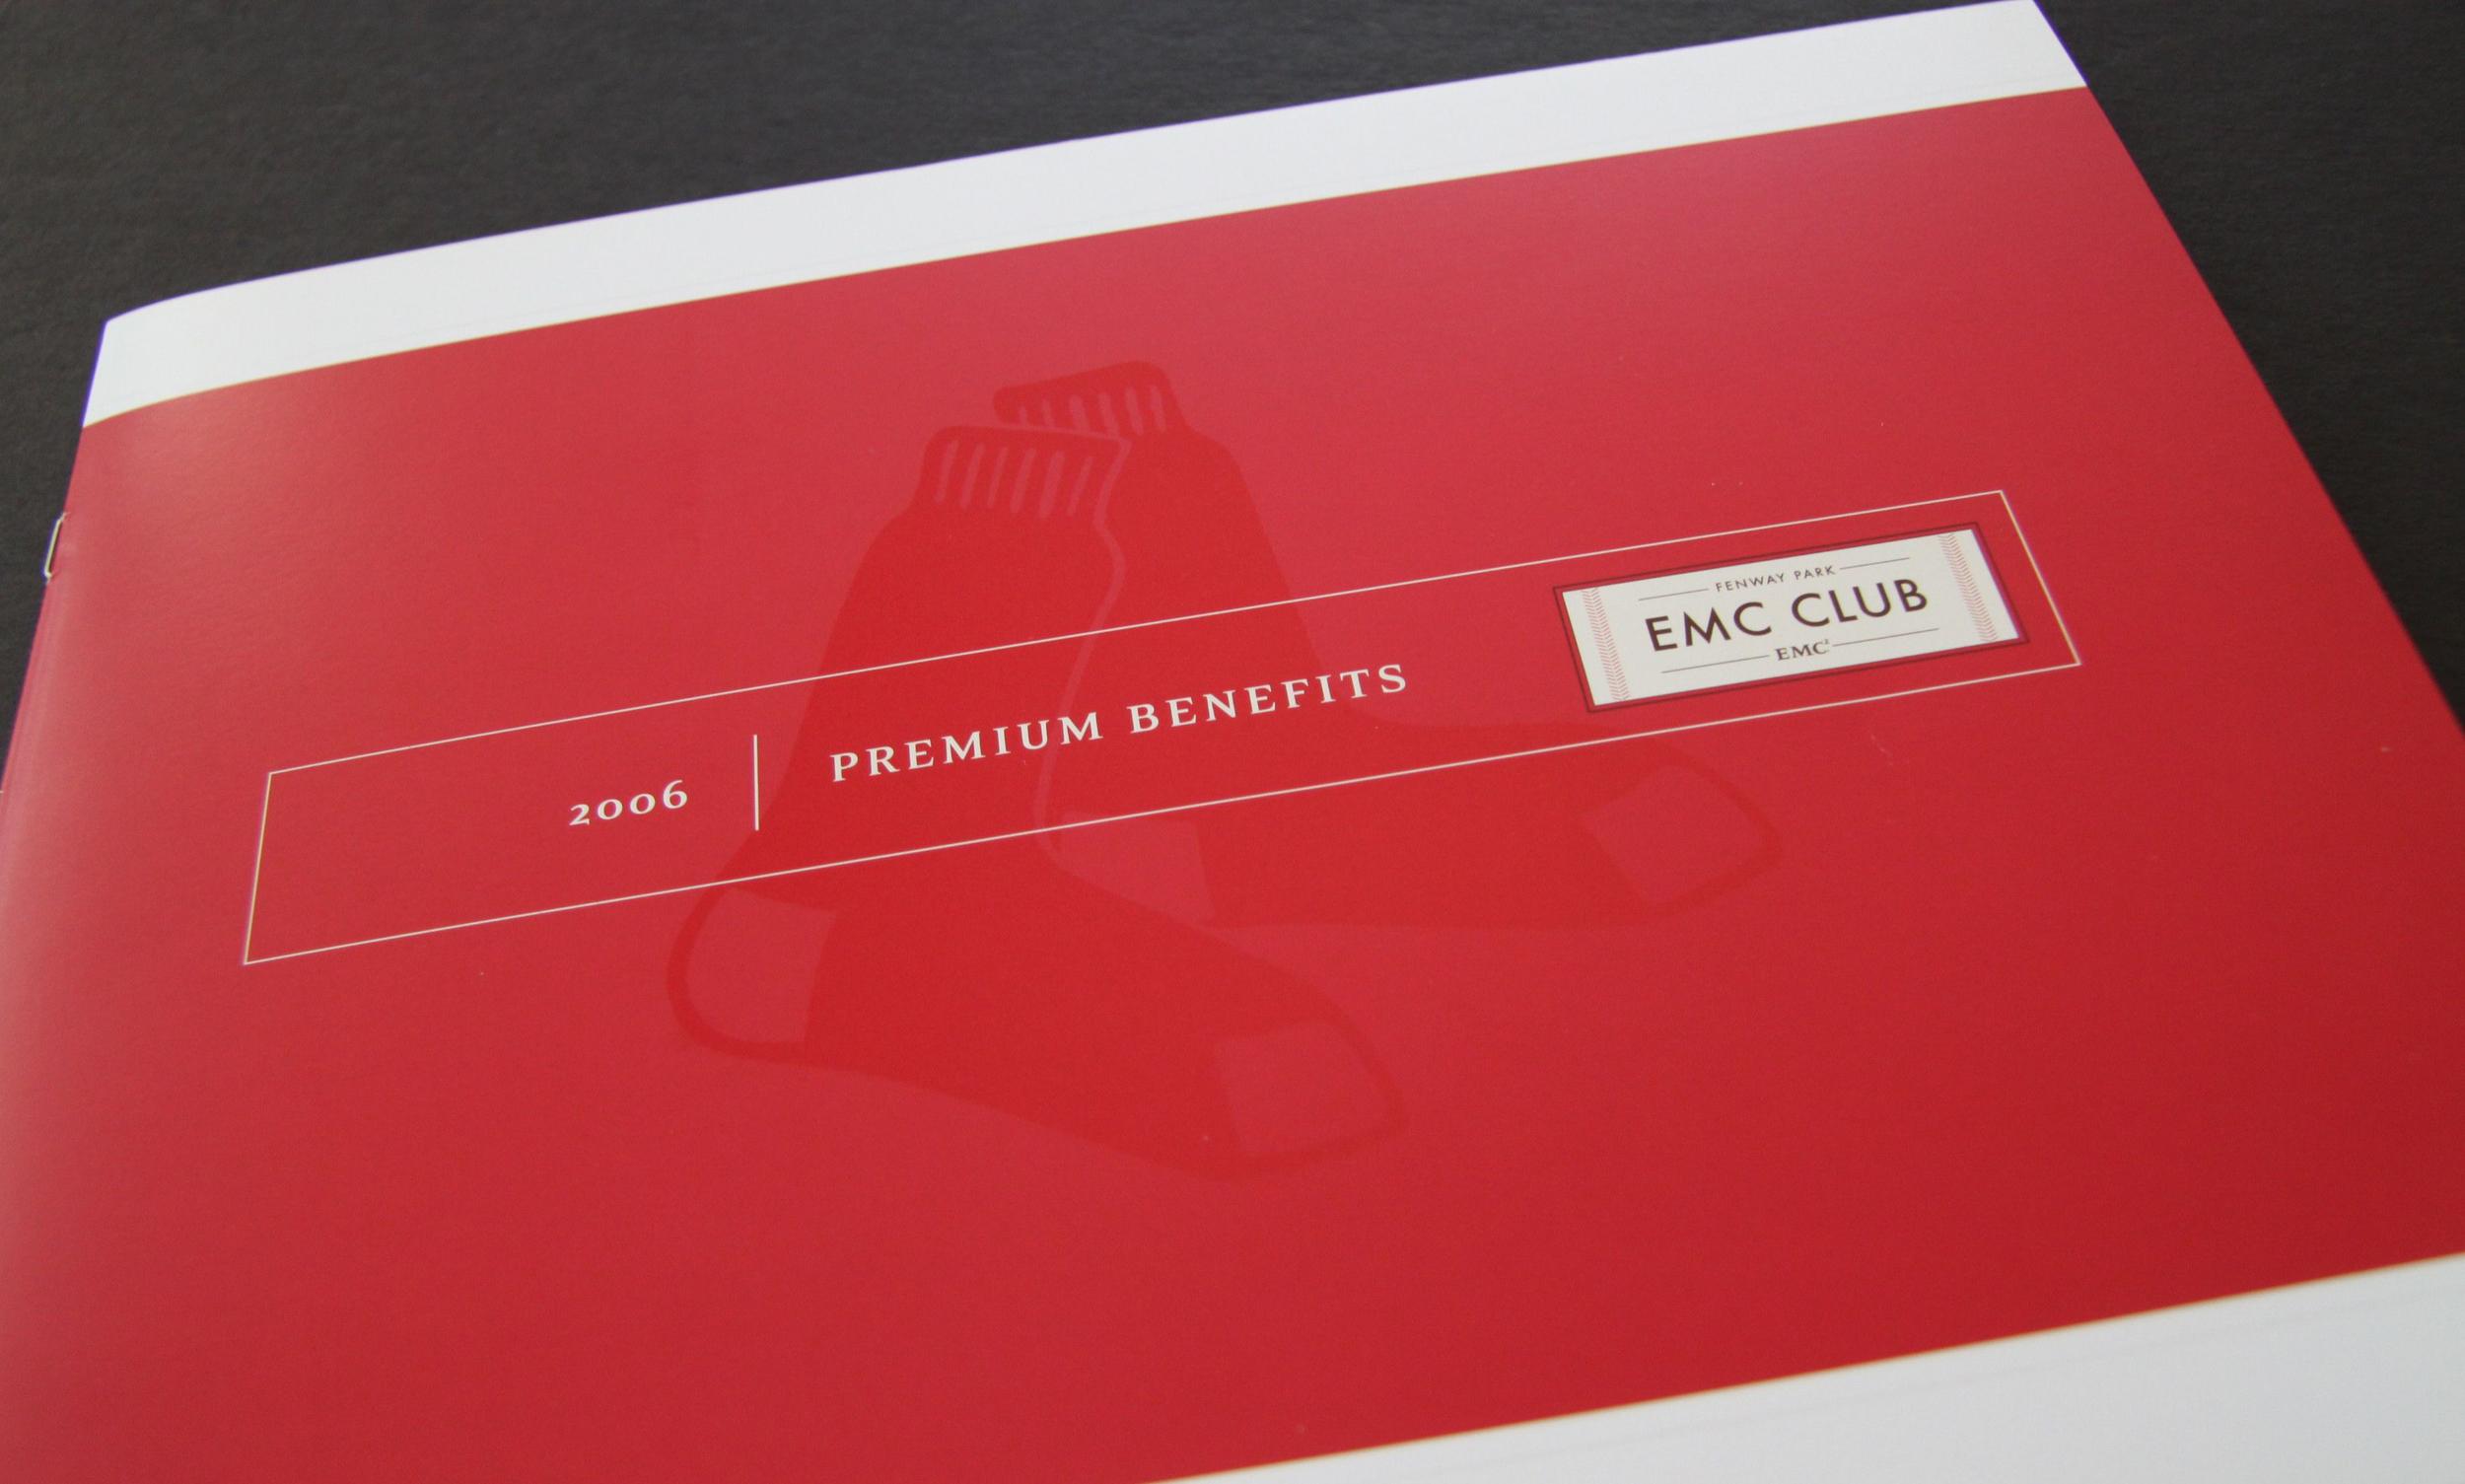 Boston Red Sox EMC Club Benefits Brochure